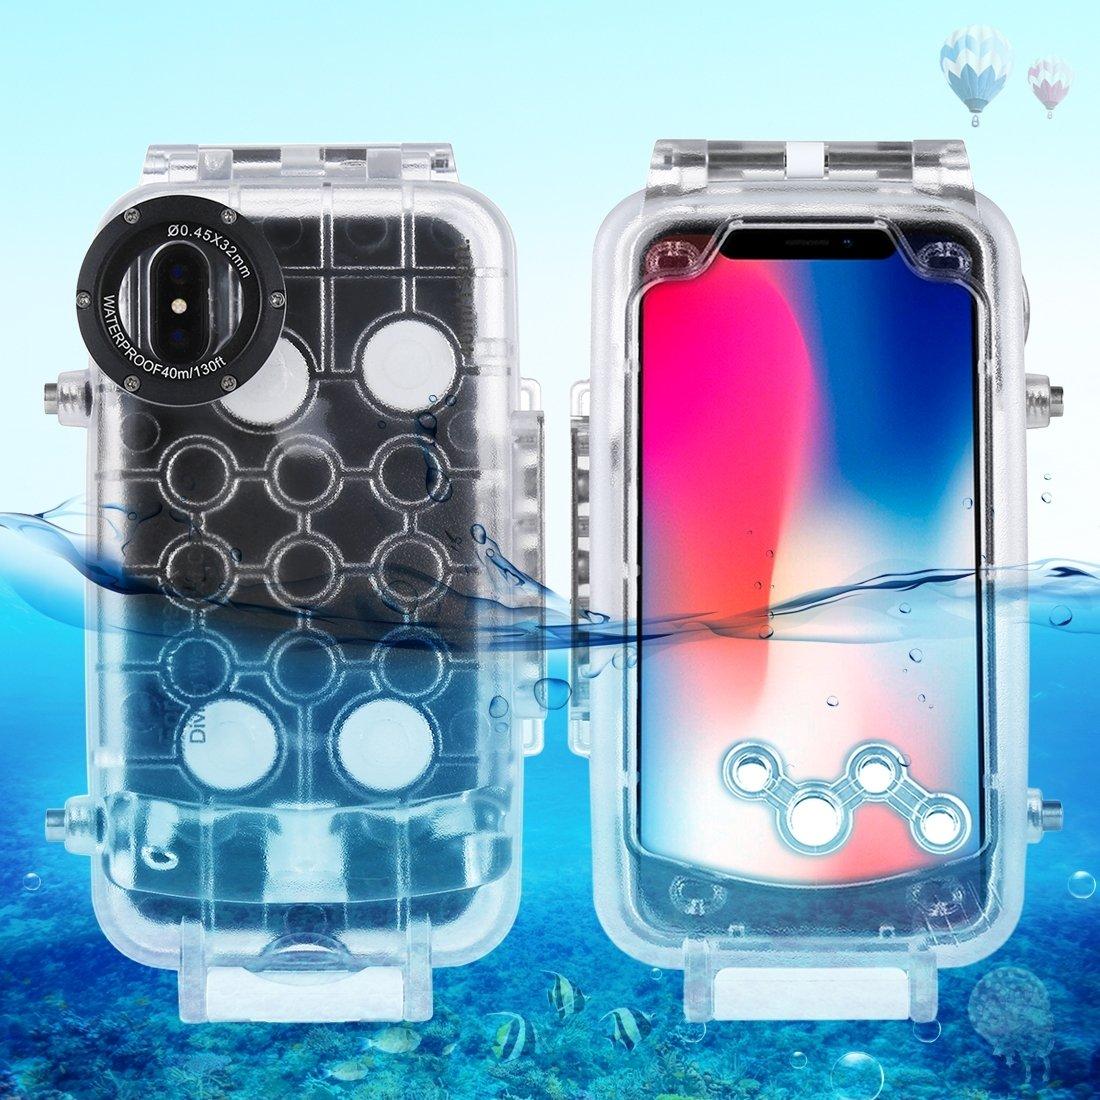 IPhone用40m / 130ft防水ダイビングハウジング写真の撮影水中カバーケース フォンケース. (Color : Transparent)   B07D2CK6J5